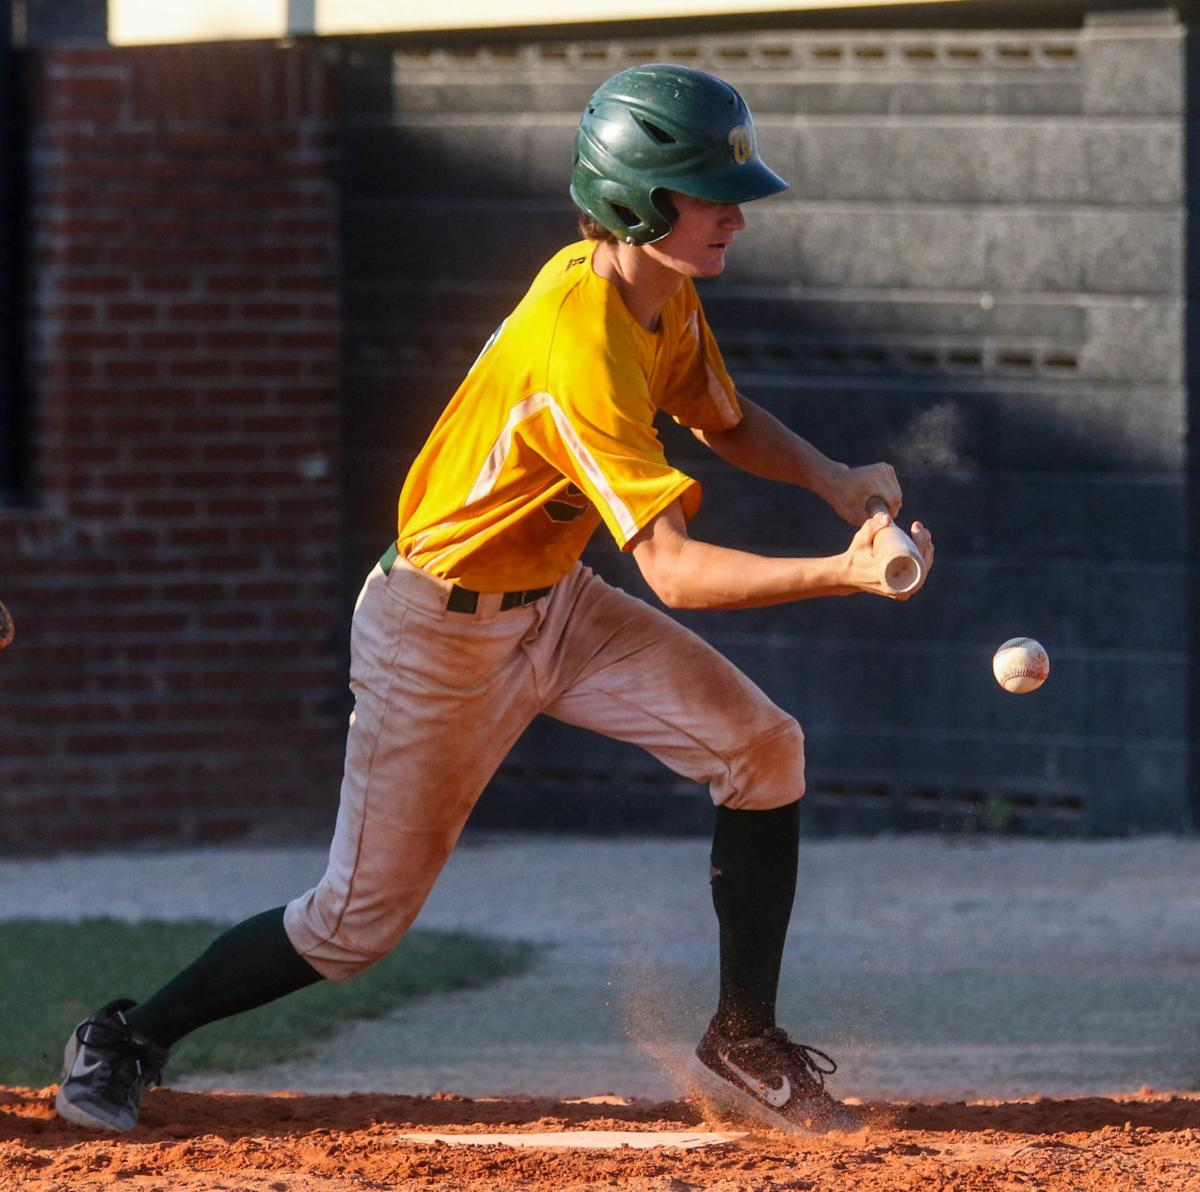 Walker summer baseball vs. Catholic: Kevin Veguilla